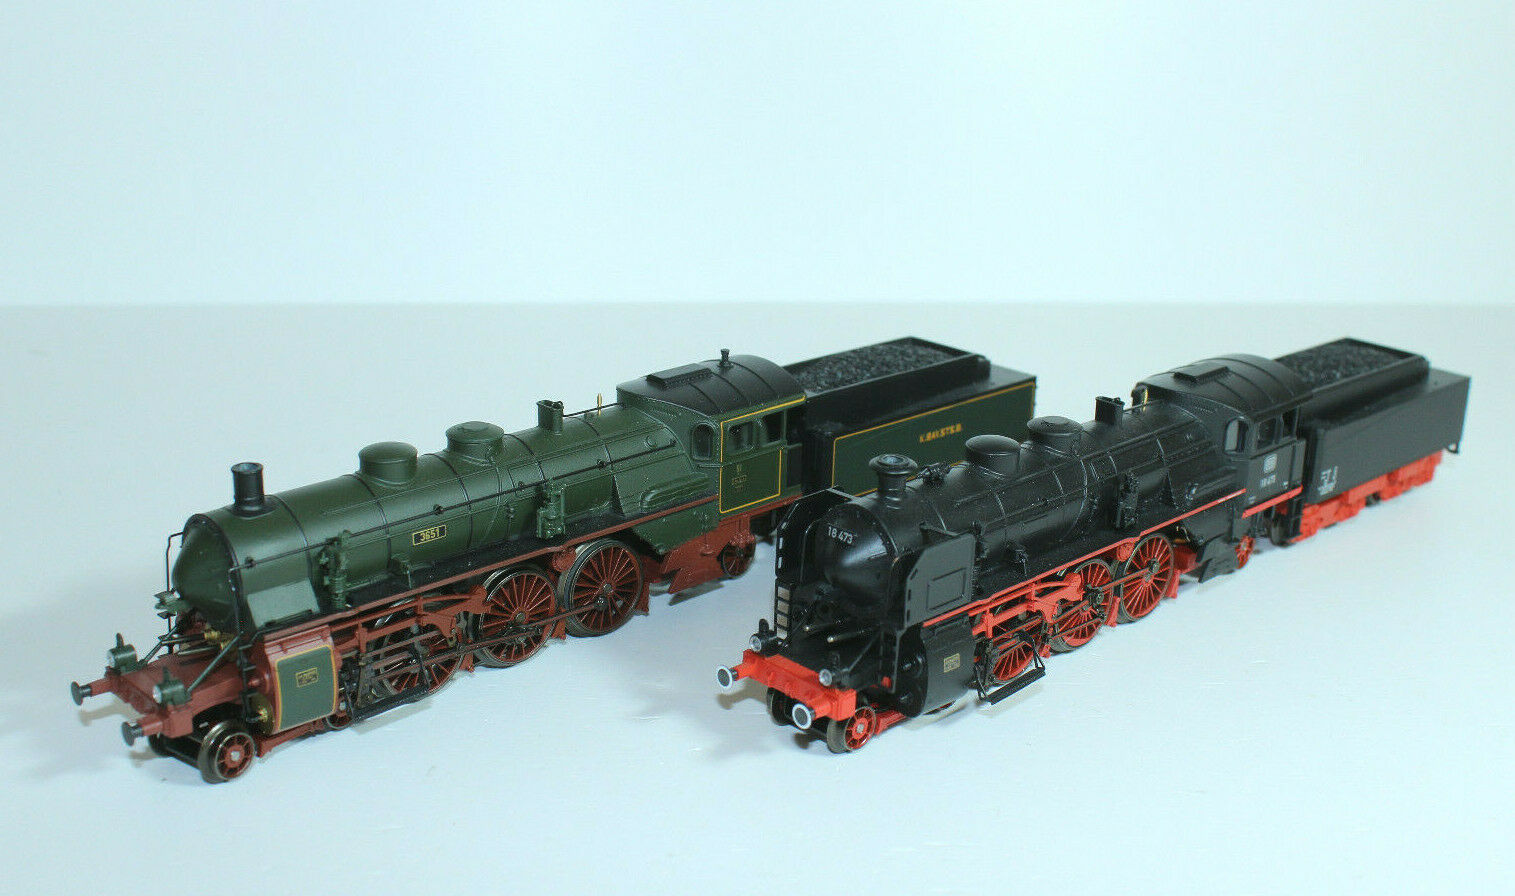 incredibili sconti marklin 37187 Set mit 2 Schlepptender-Dampflokomotiven    S 3 6  - NEU - RAR    vendita calda